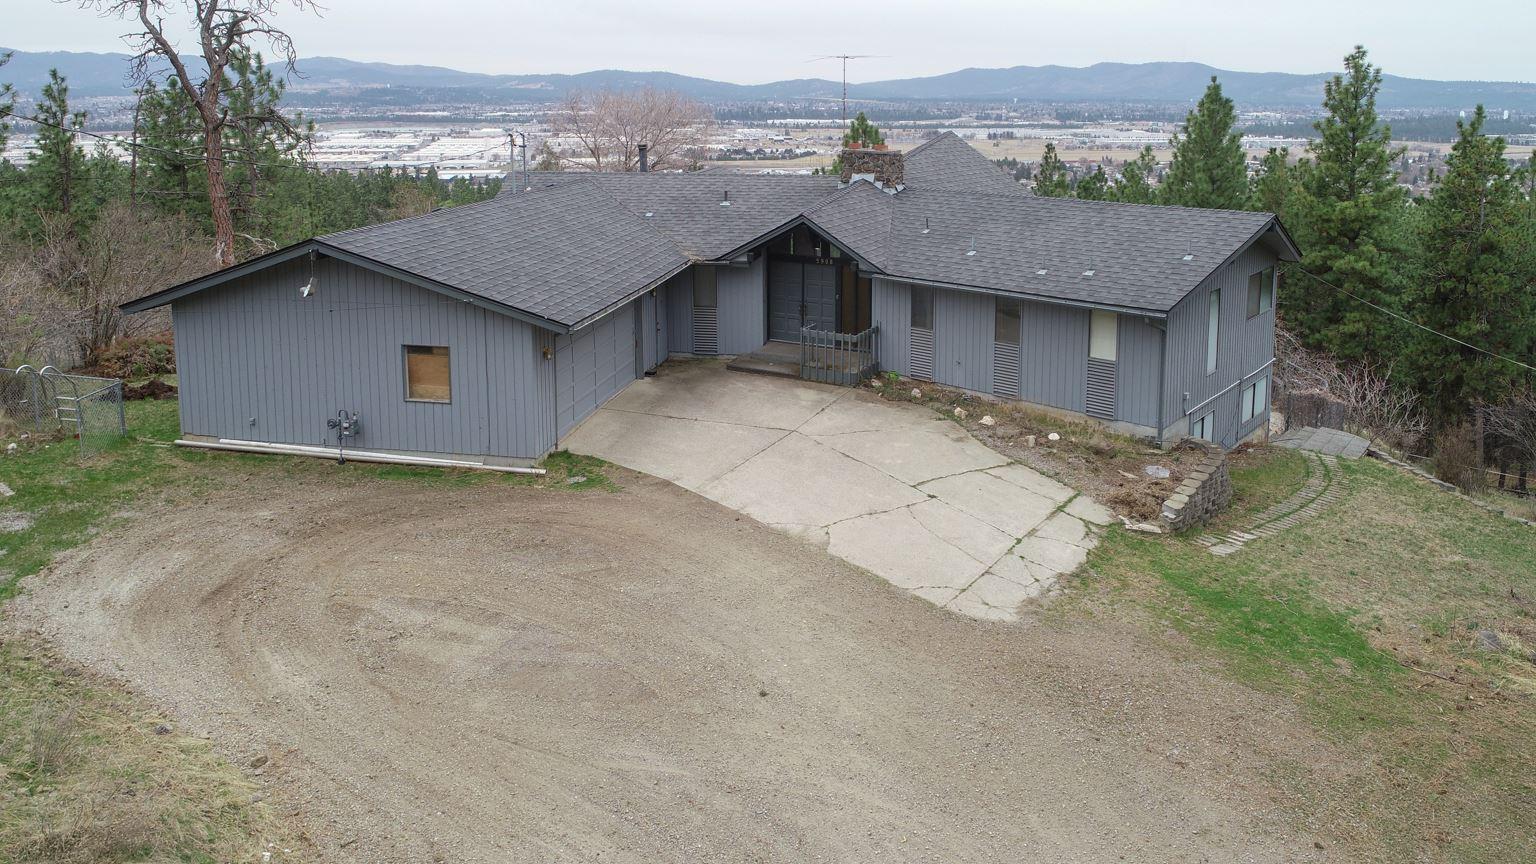 5908 N Highview Ln, Spokane, WA 99217-9202 - #: 202113769